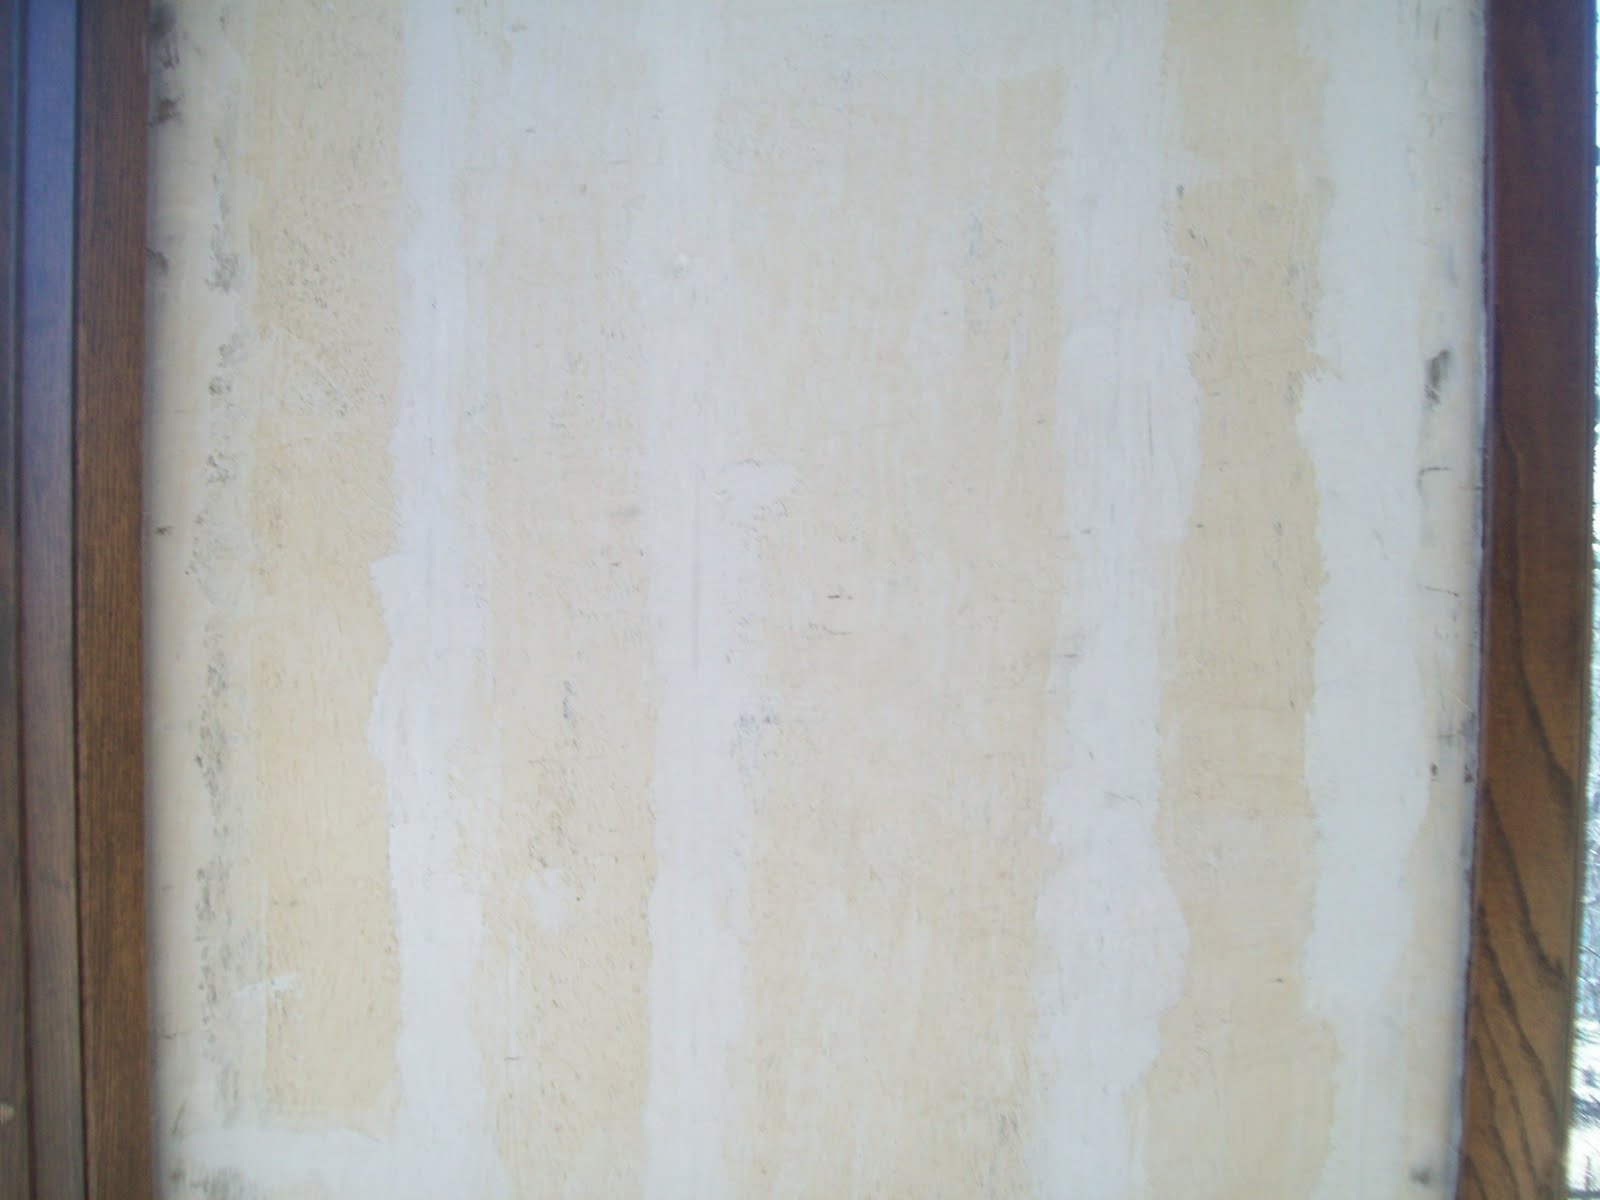 Herreras Textures Finishes 1600x1200